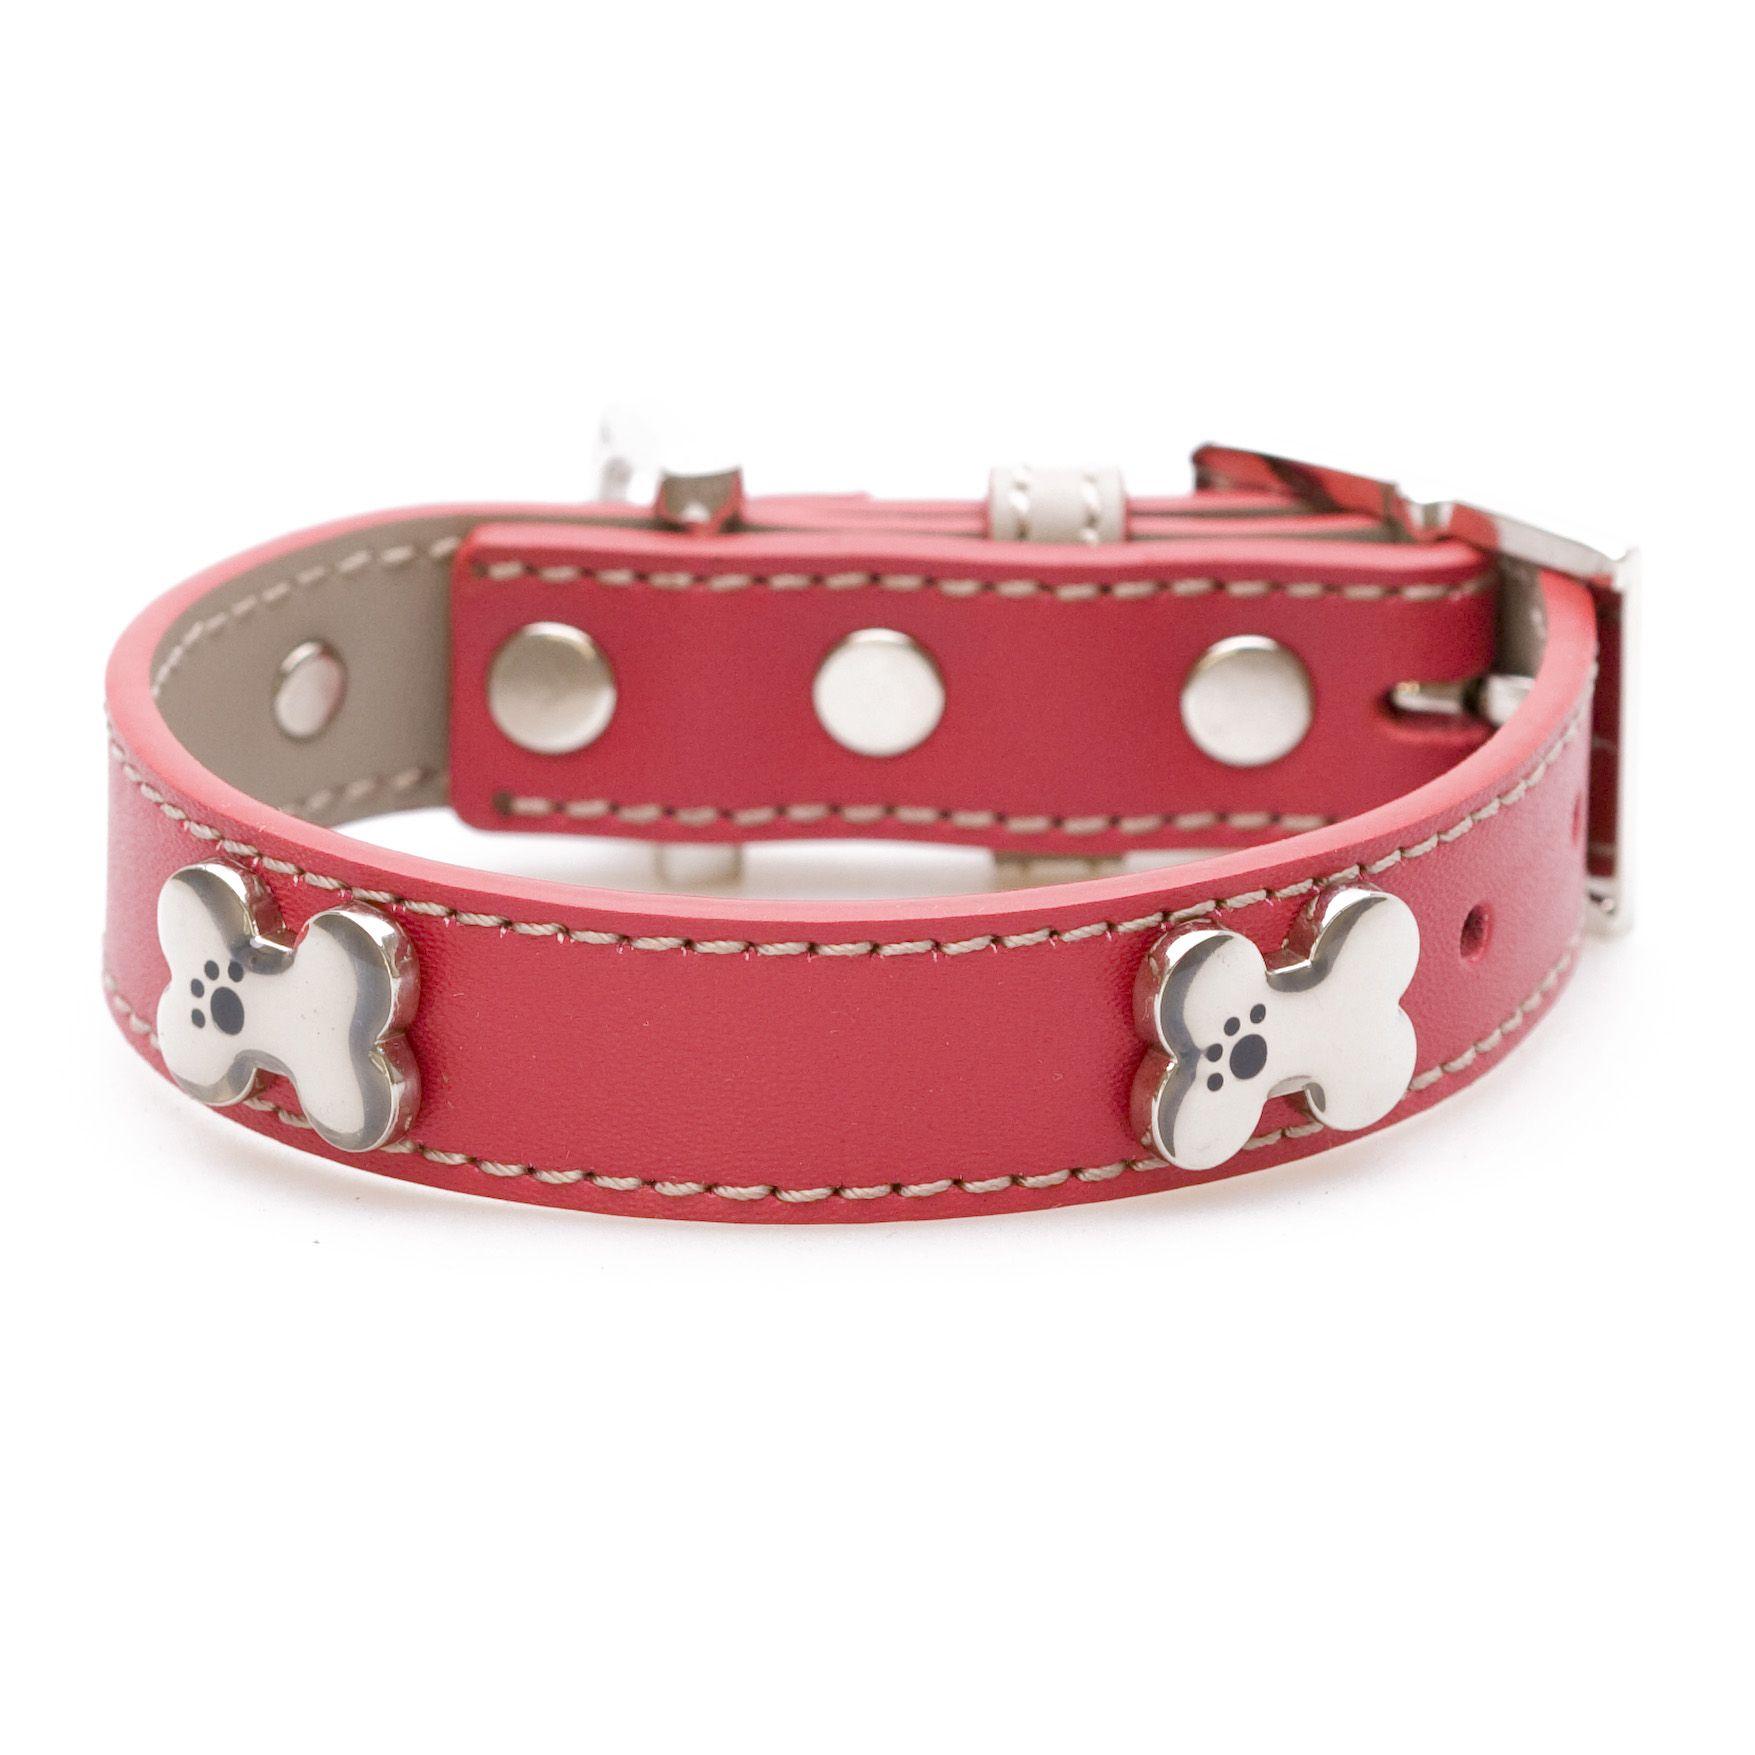 Bone Bling Red Dog Collar Leather dog collars, Red dog